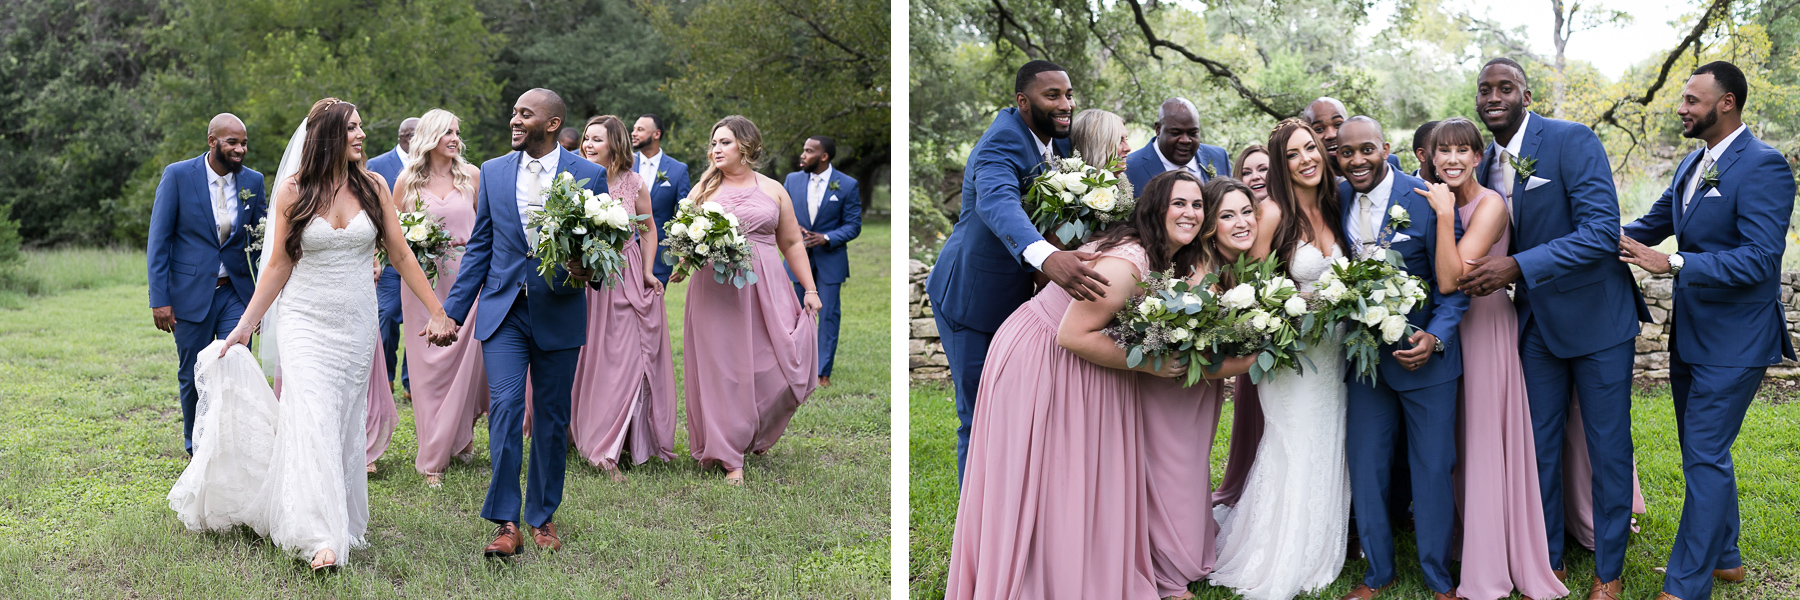 blush-and-blue-wedding-party.jpg